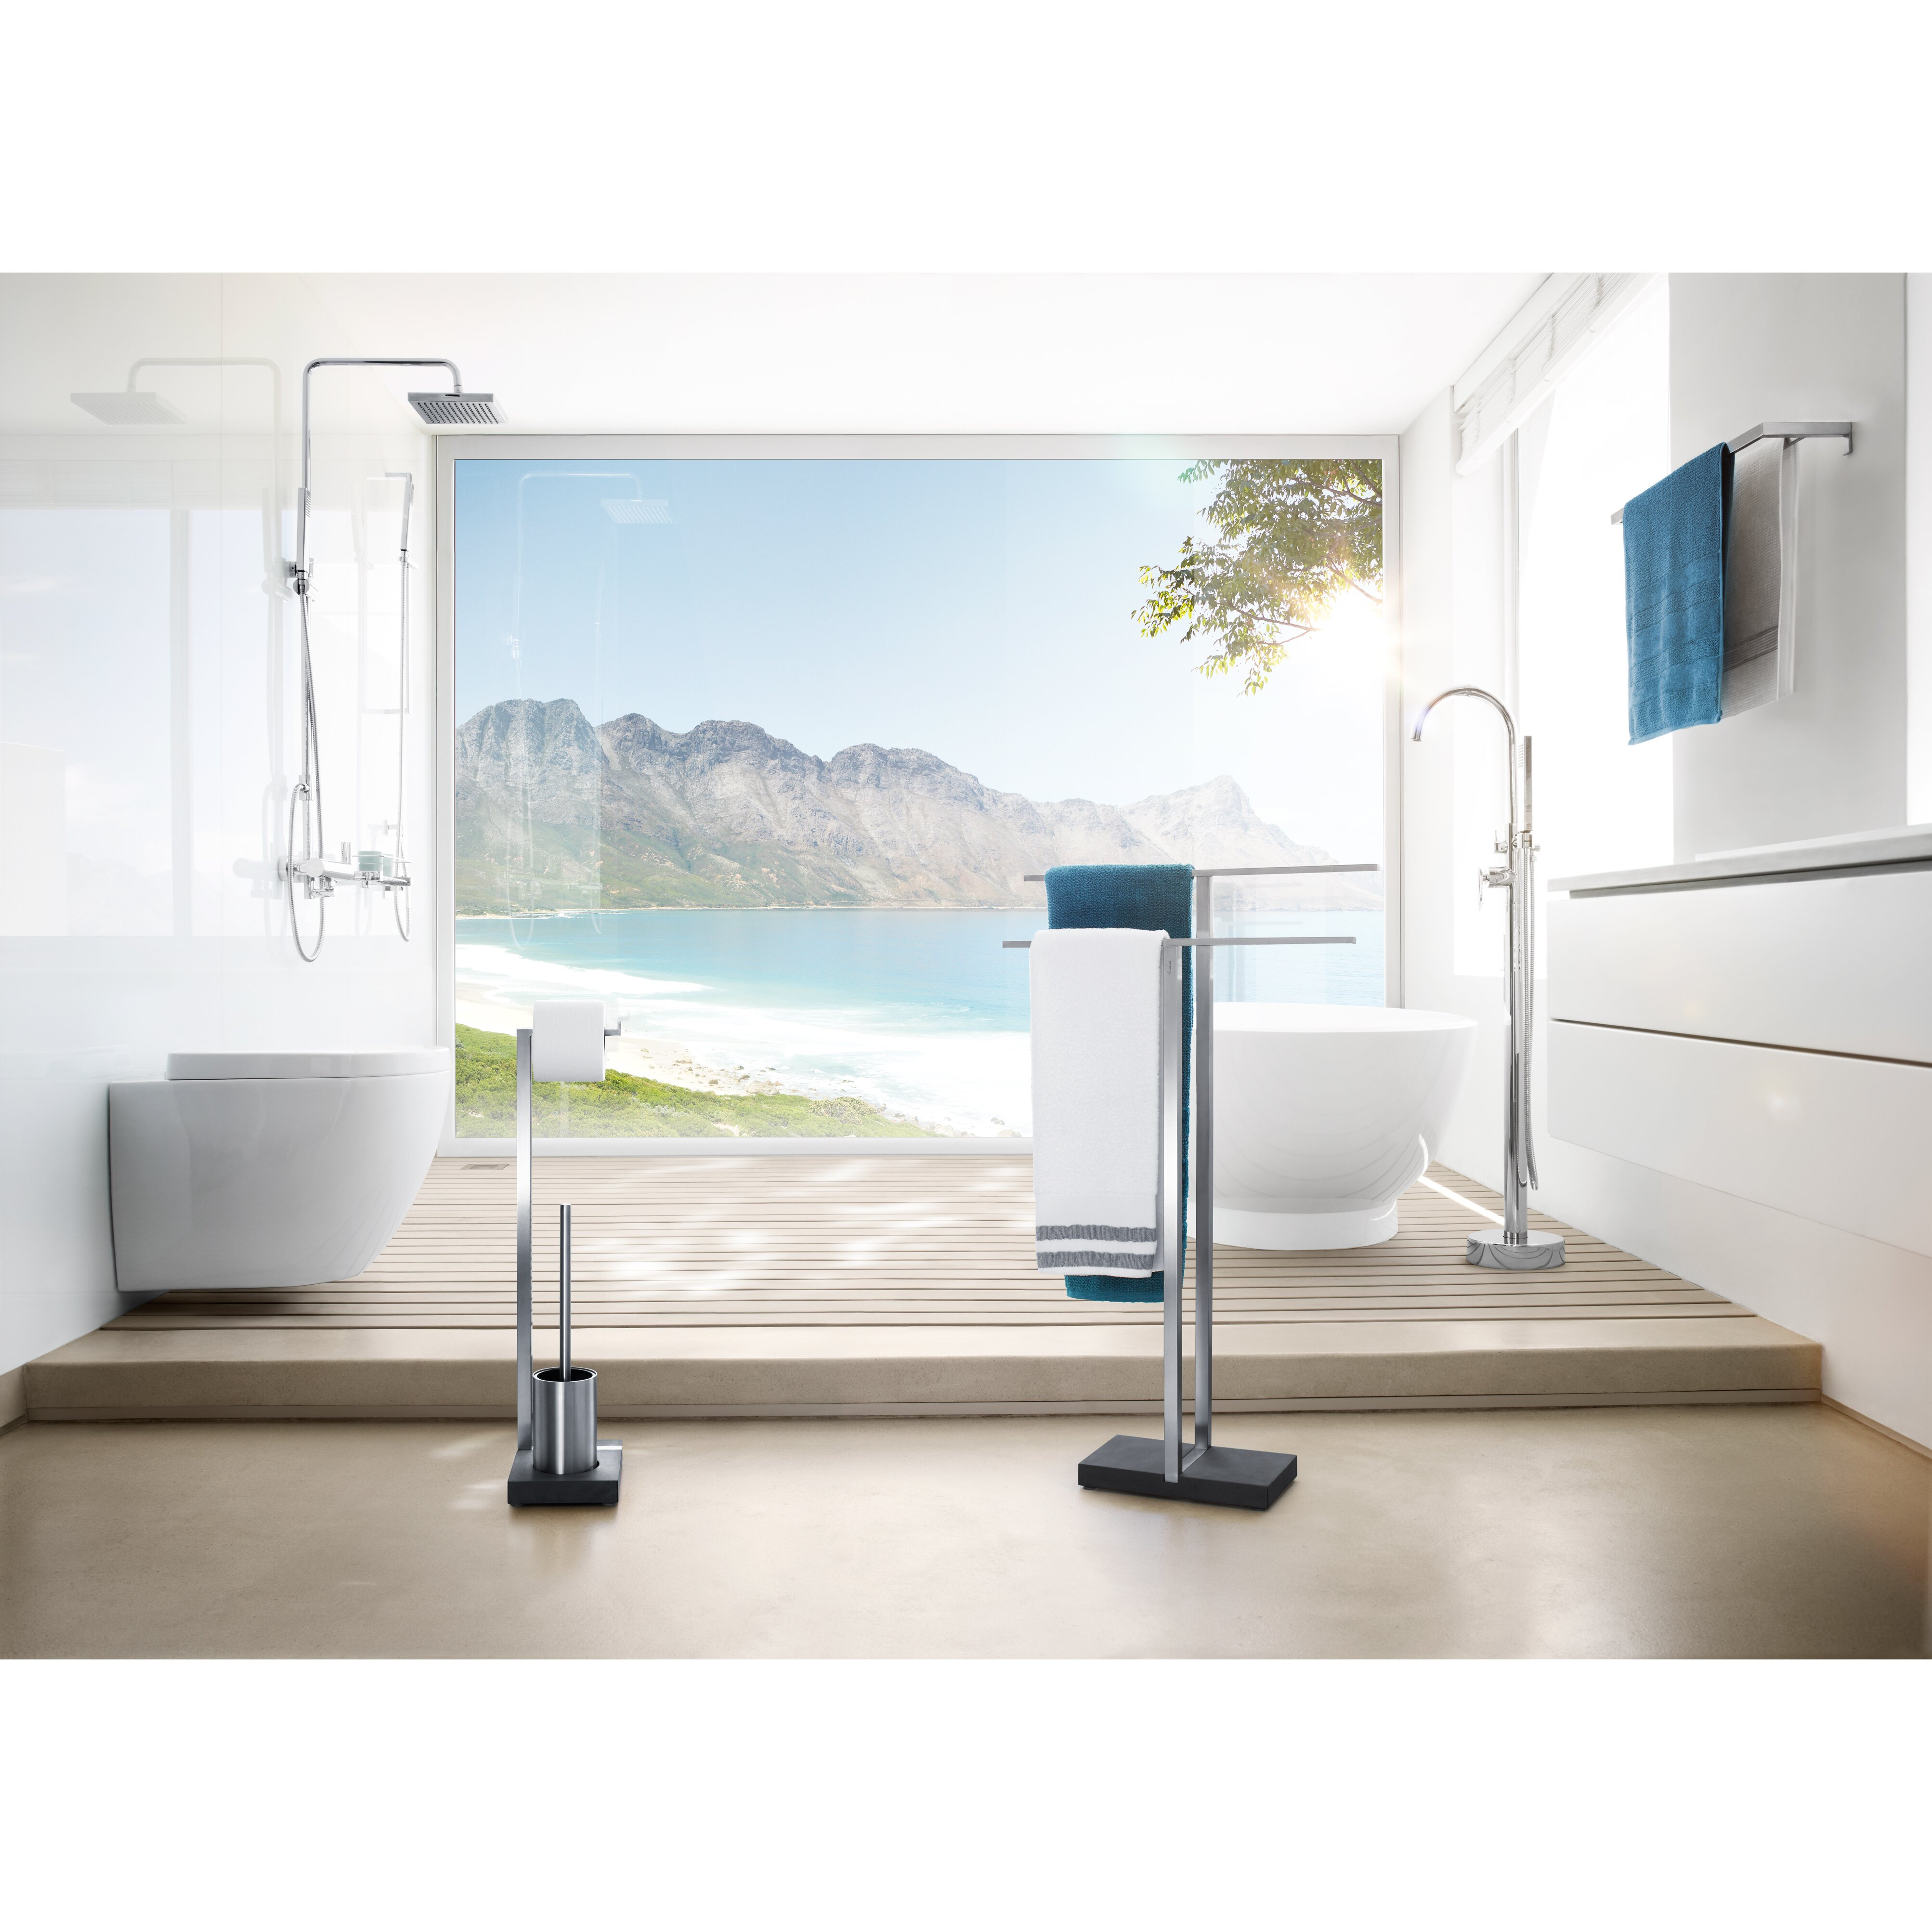 blomus menoto freestanding stainless steel matte towel. Black Bedroom Furniture Sets. Home Design Ideas